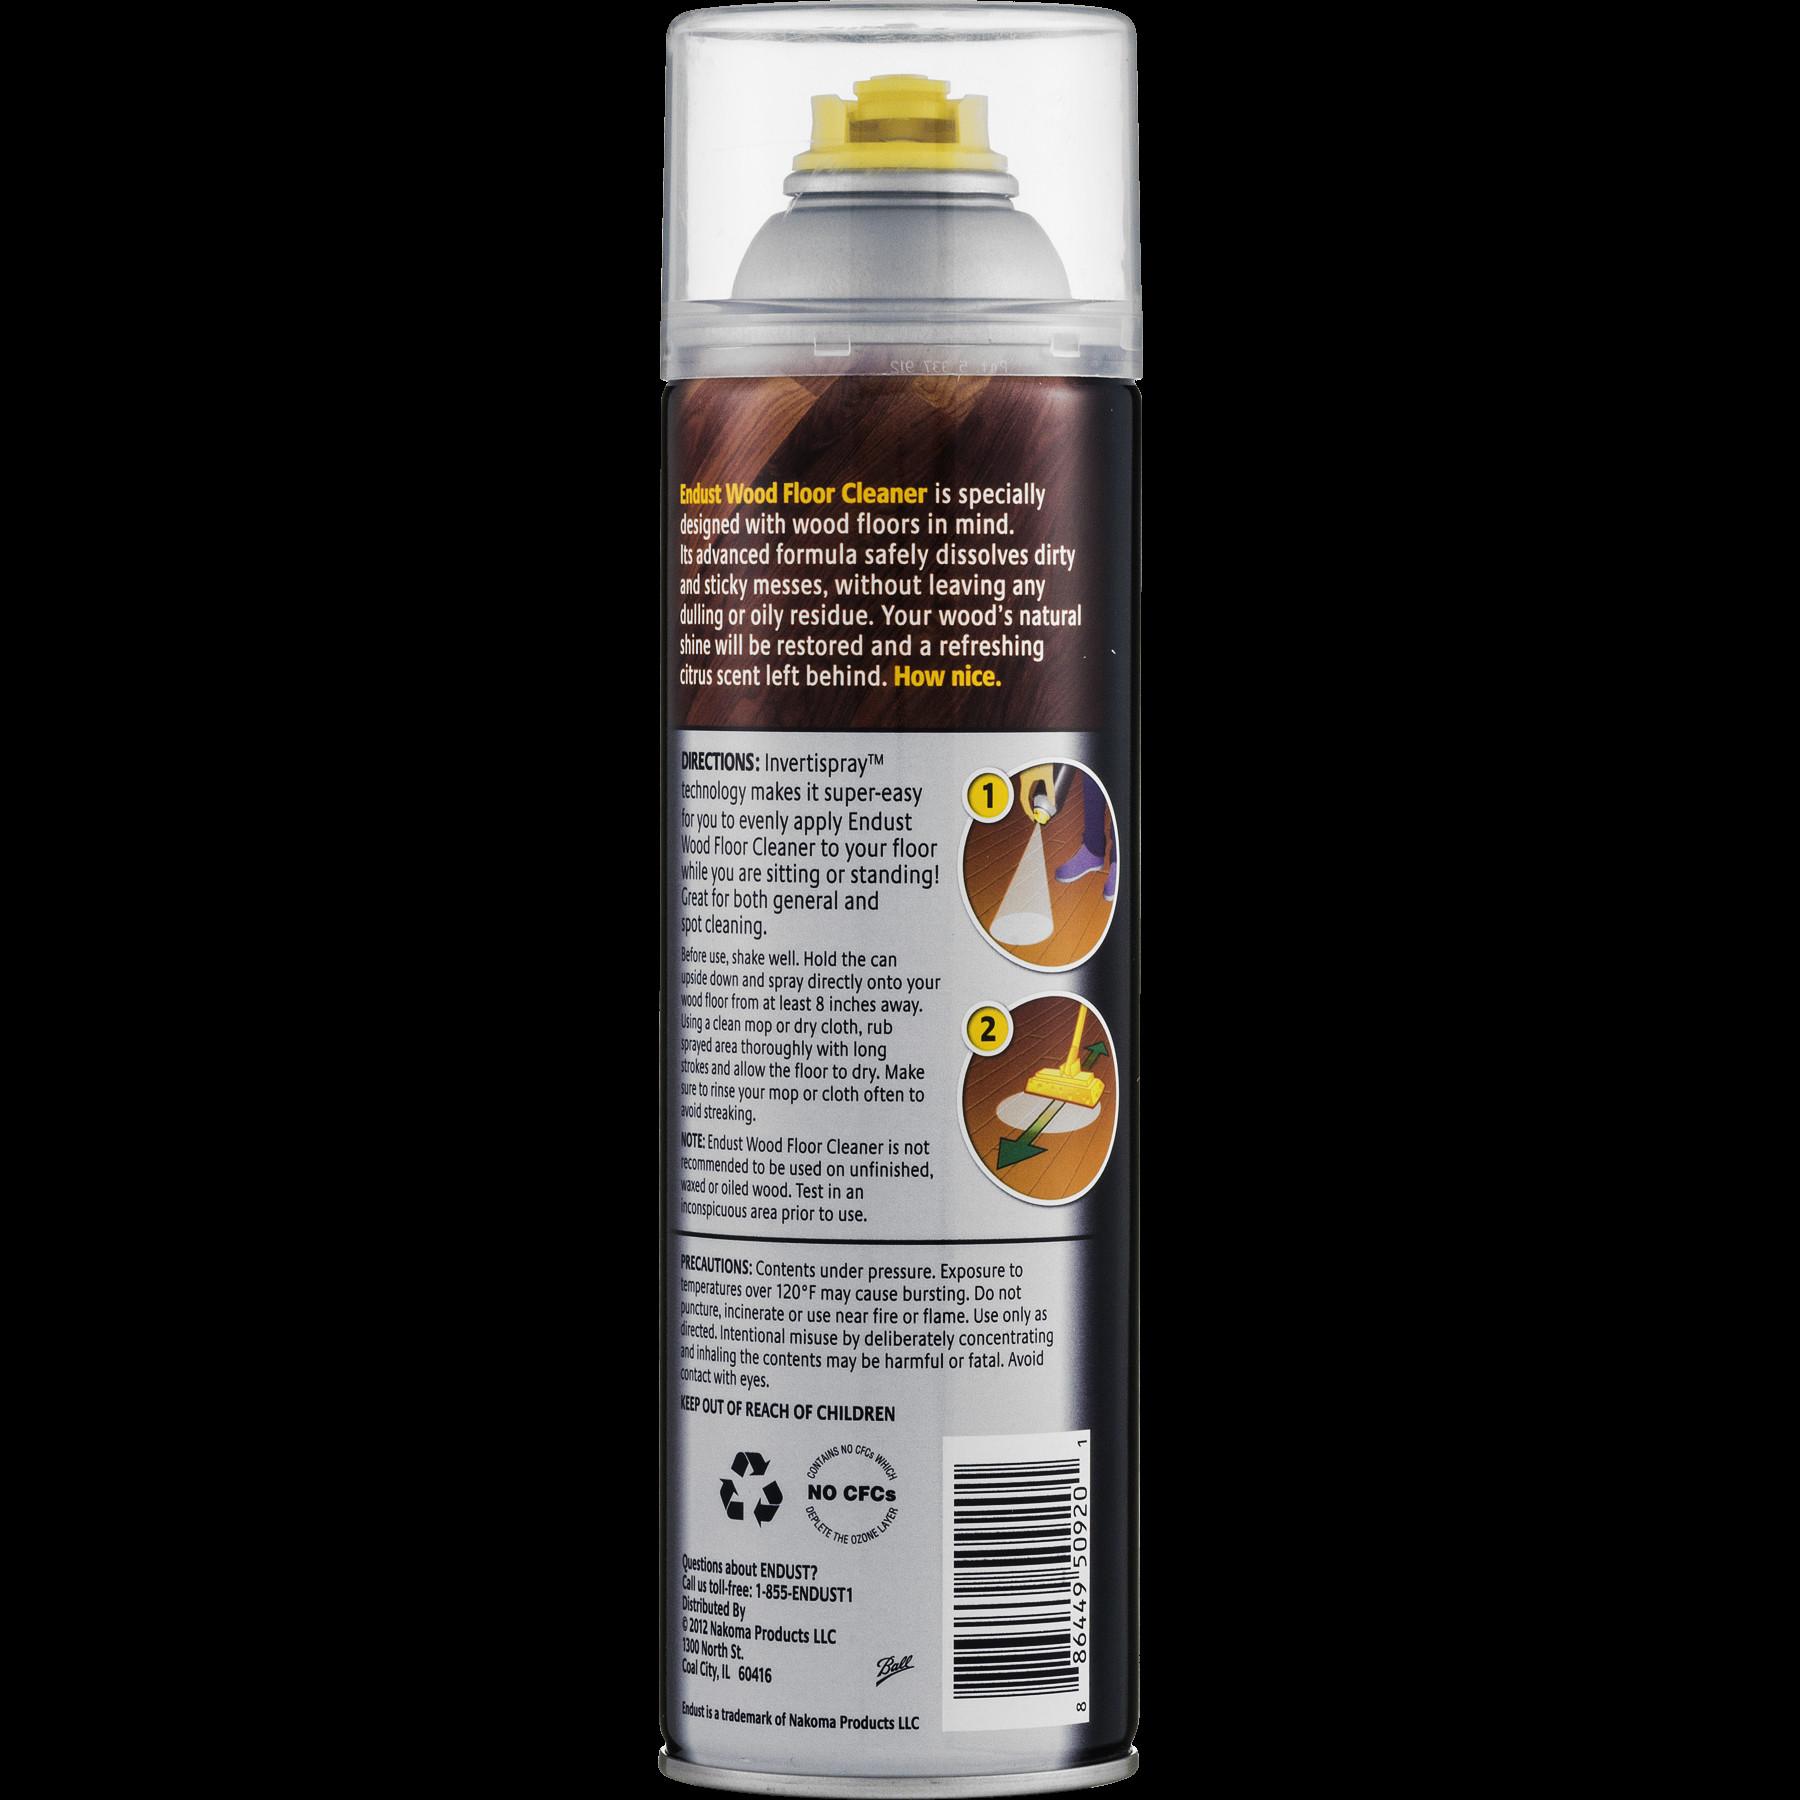 hardwood floor cleaning system of endust citrus wood floor cleaner 16 oz walmart com with c1bc18ce 4878 4020 bfbf 56078c3f3579 1 8de699e37b672020d95758afb3820548